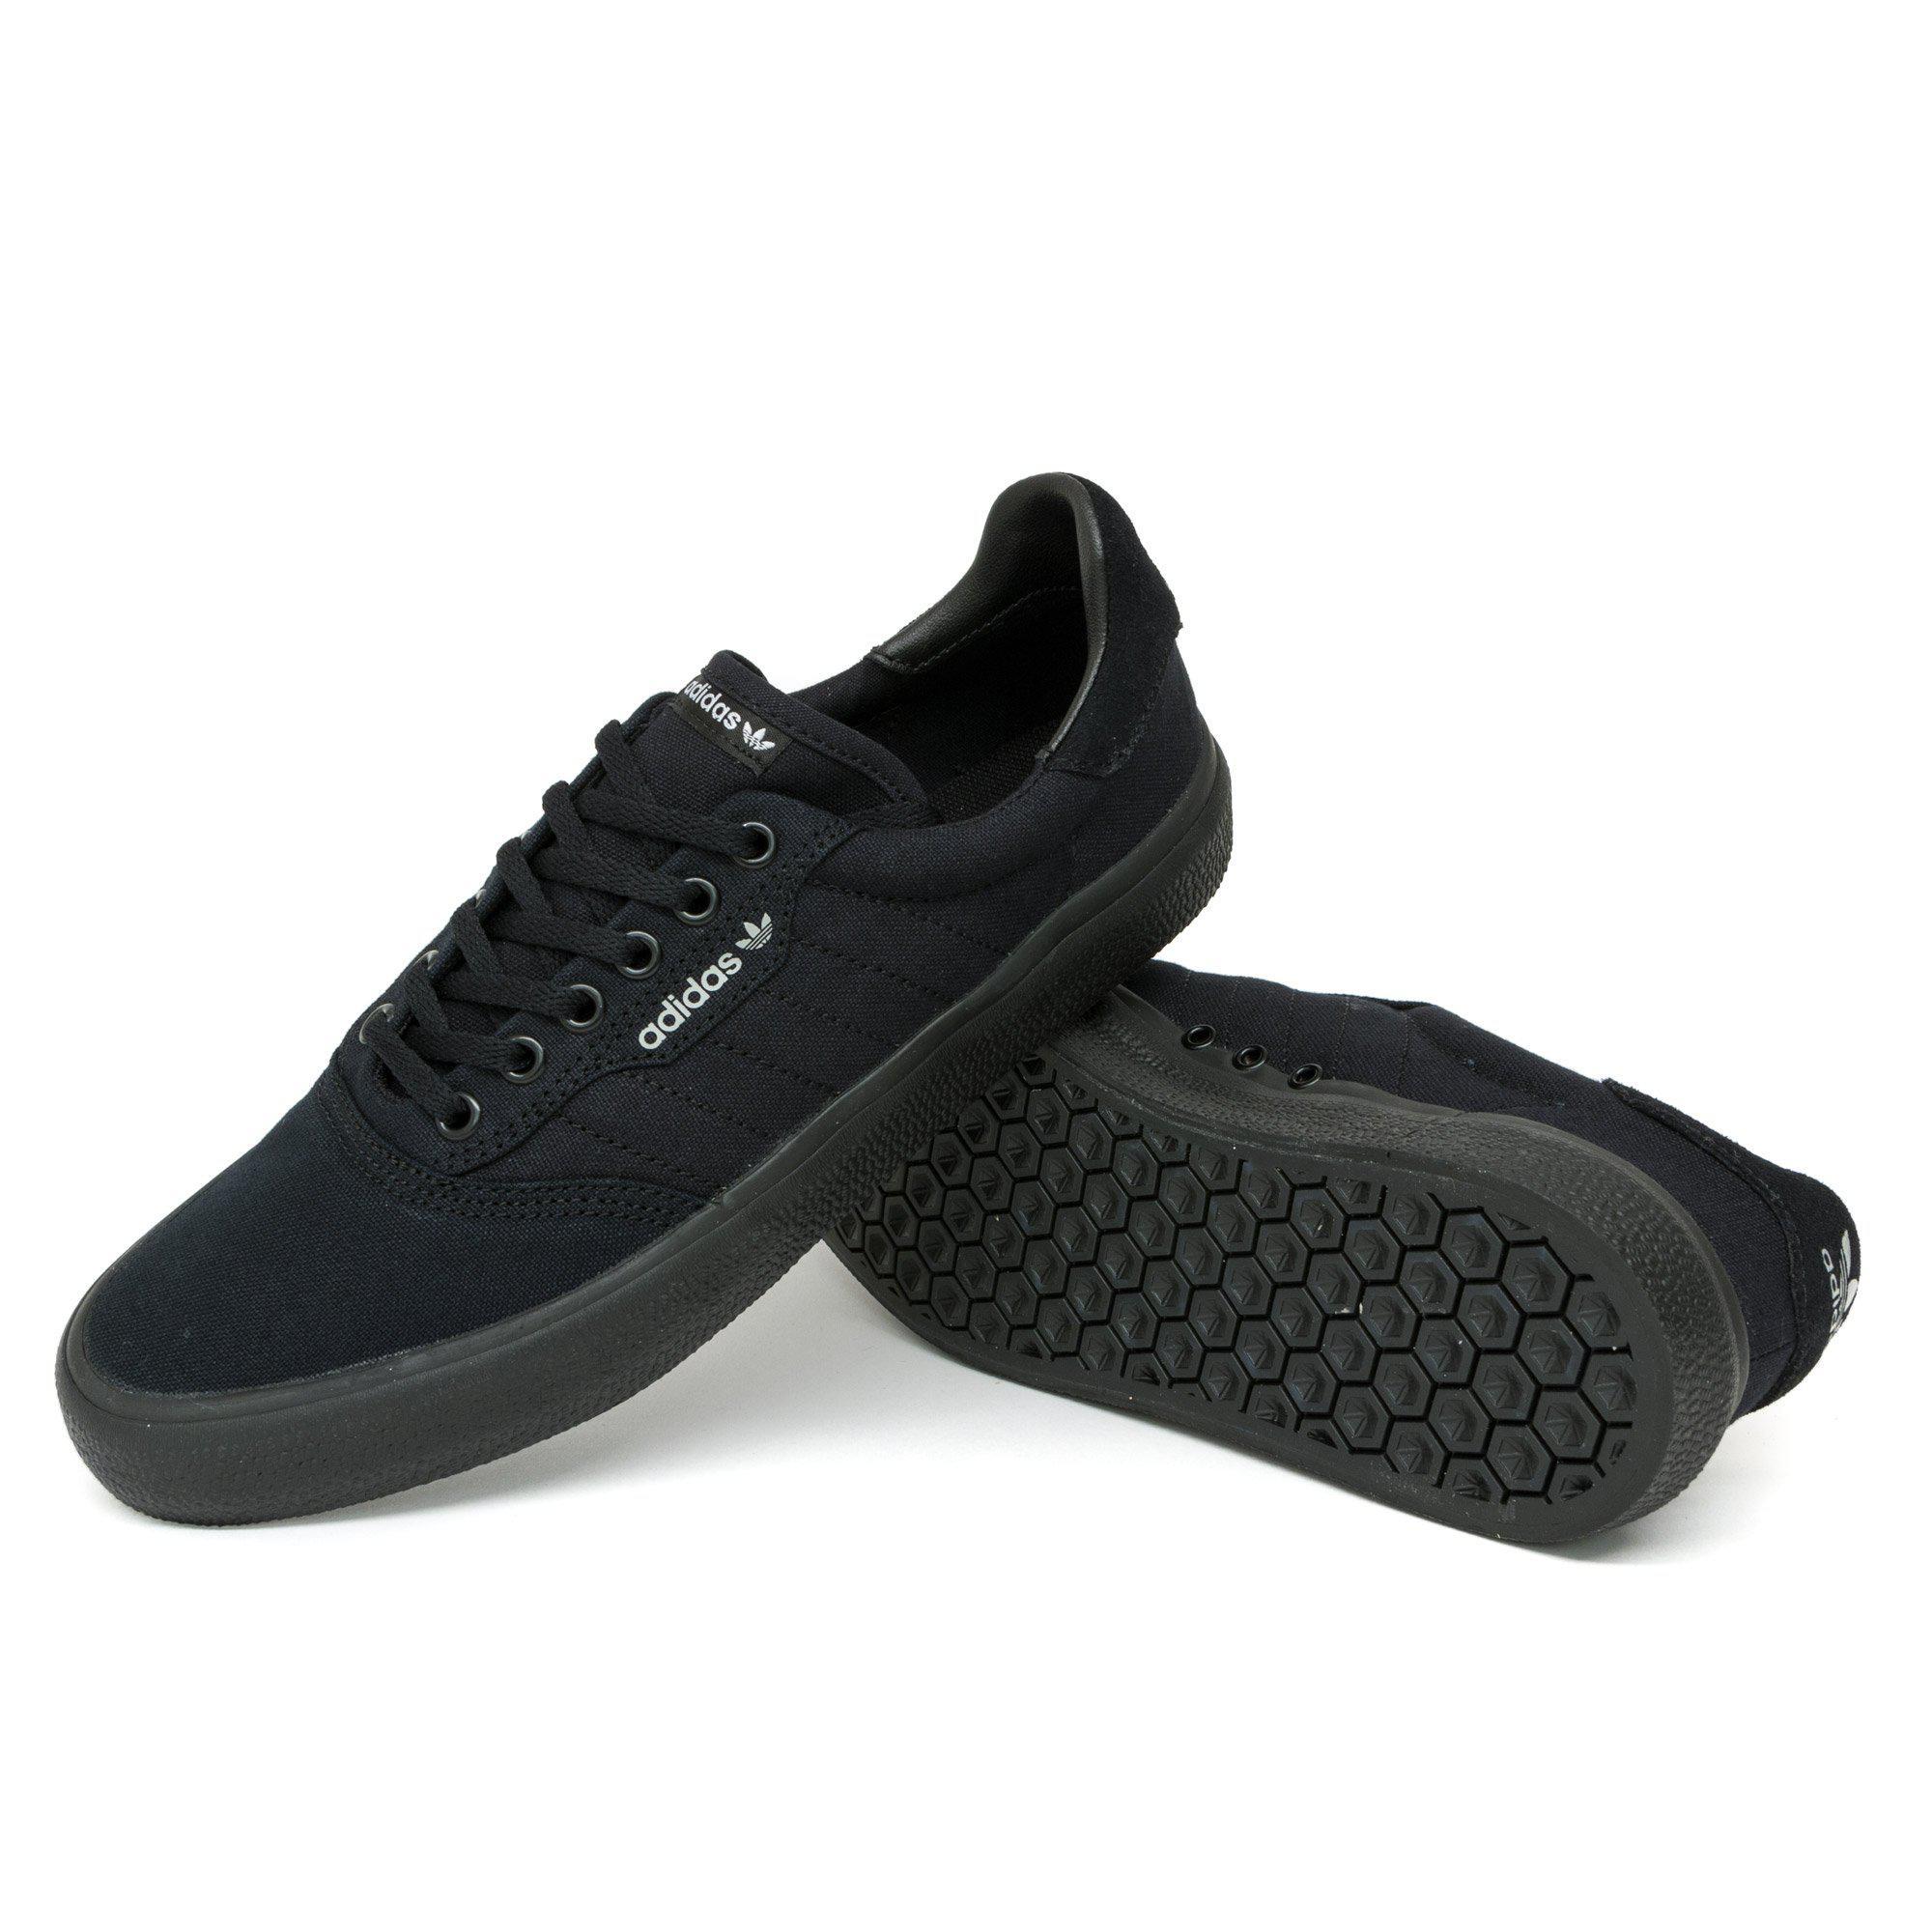 adidas Canvas 3mc Vulc Shoes in Black